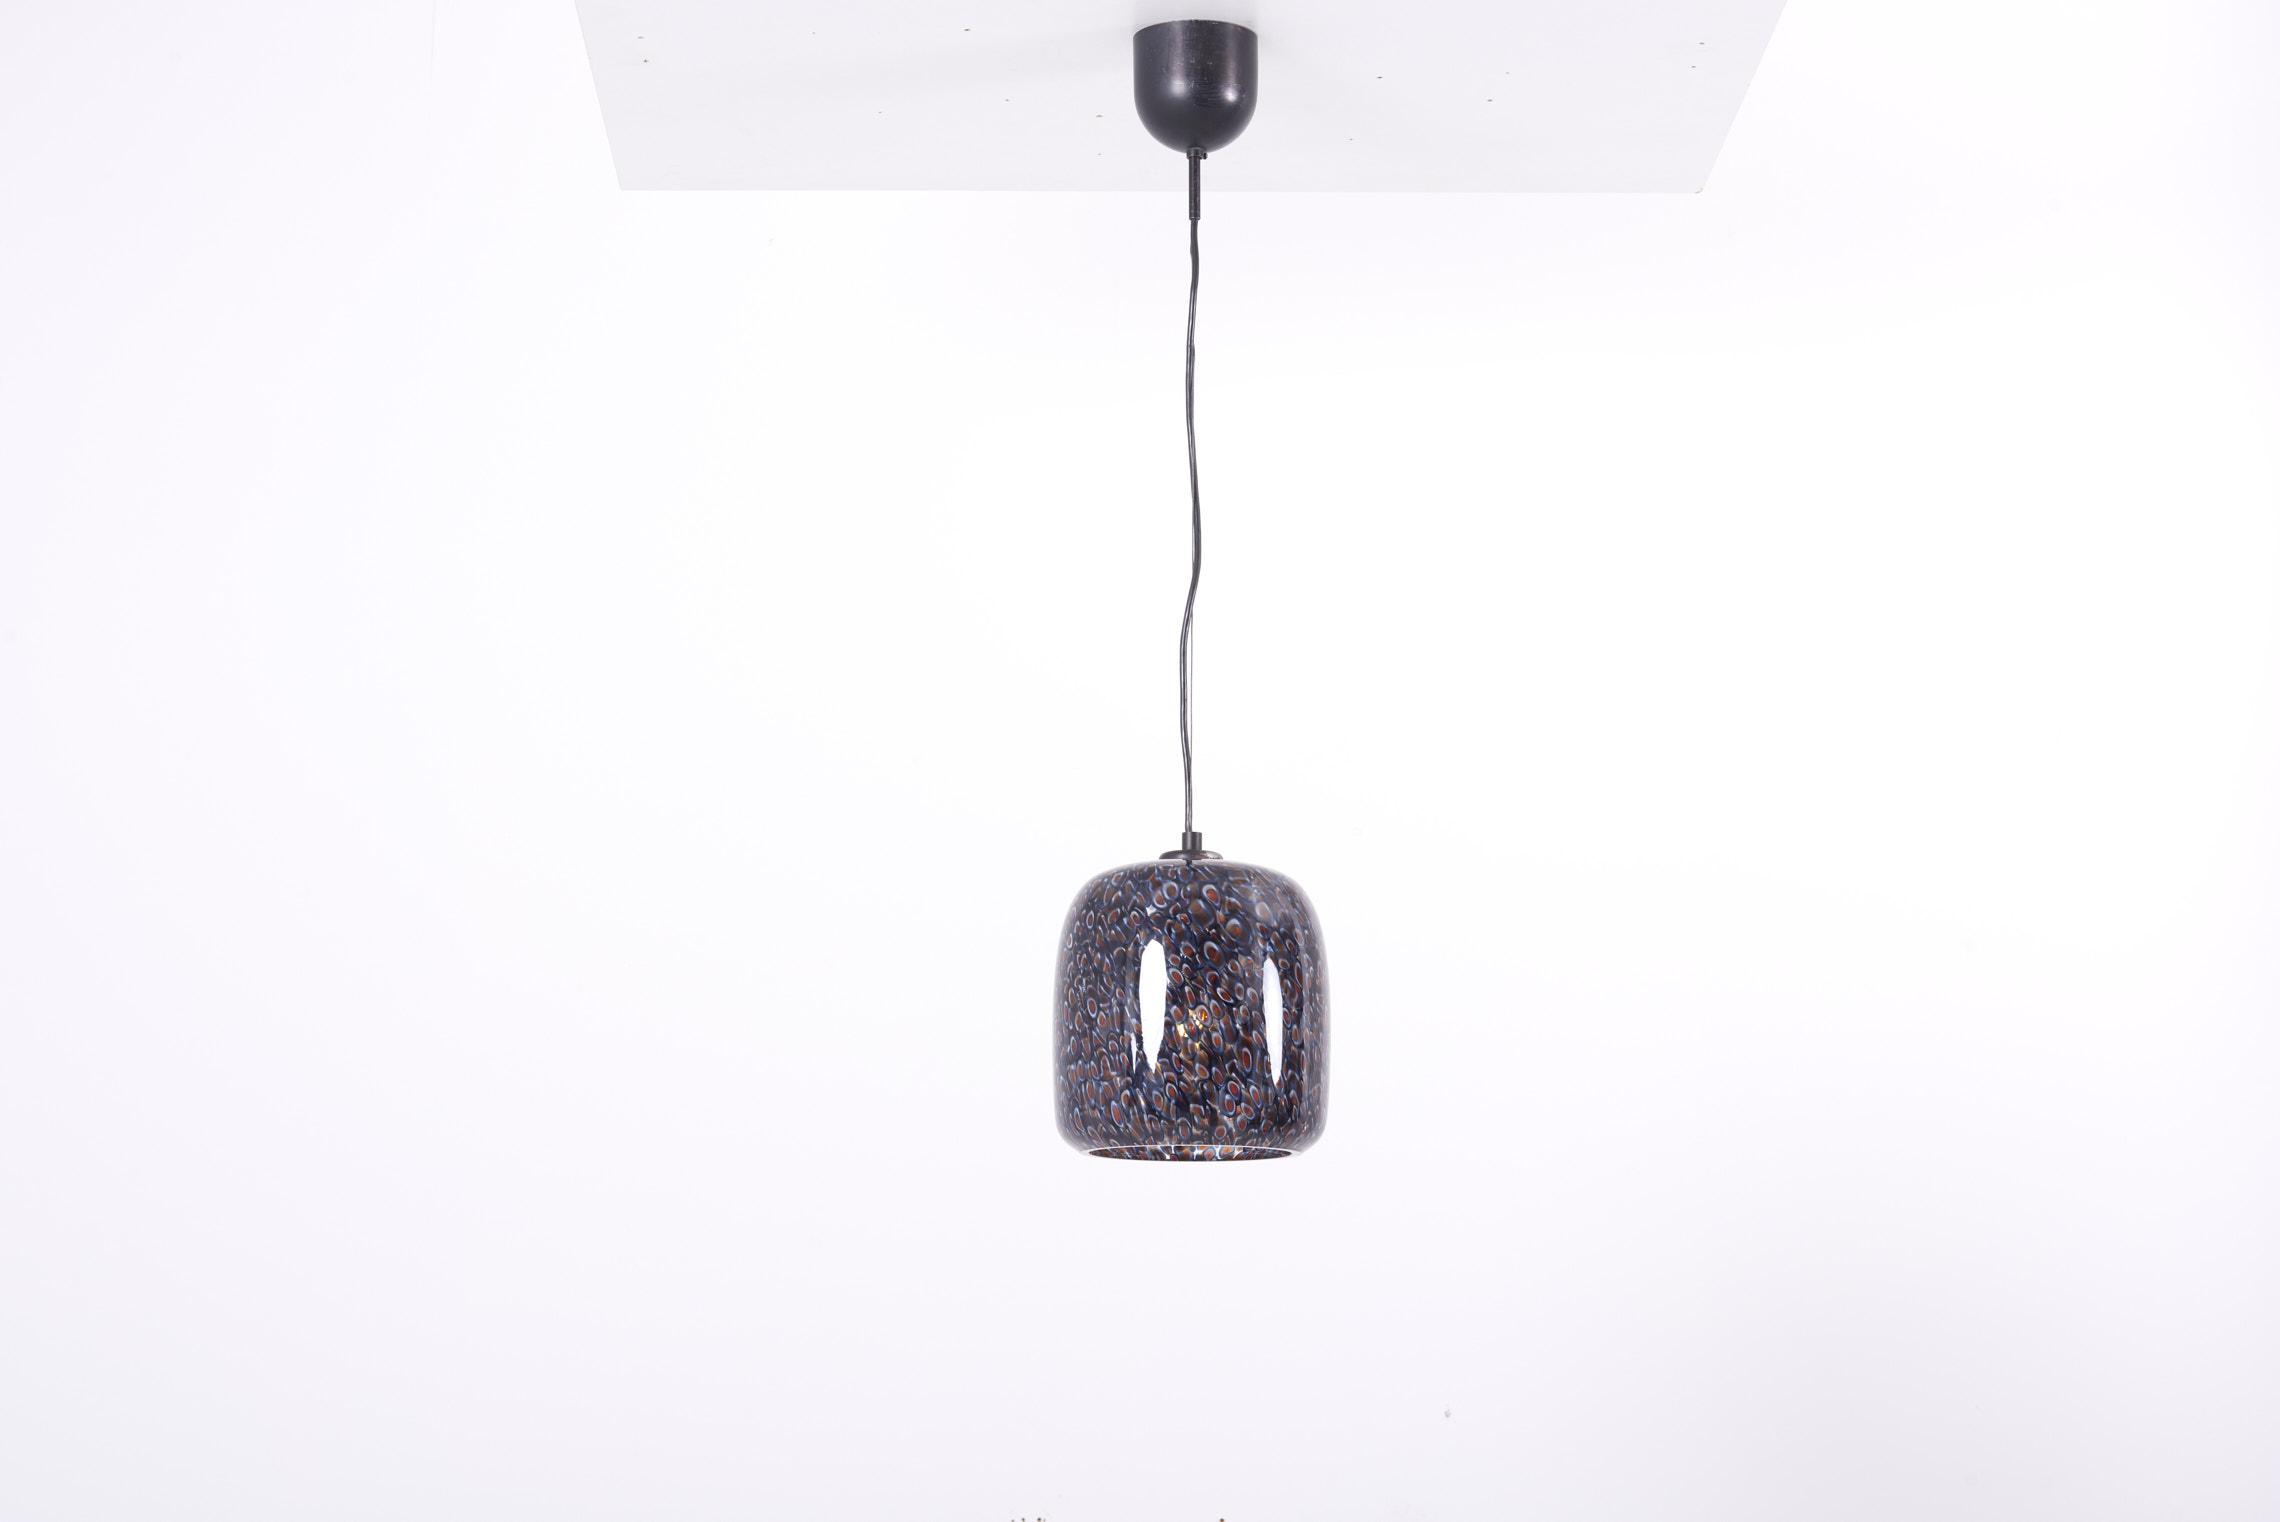 Neverrino Glass Pendant Lamp By Gae Aulenti For Vistosi